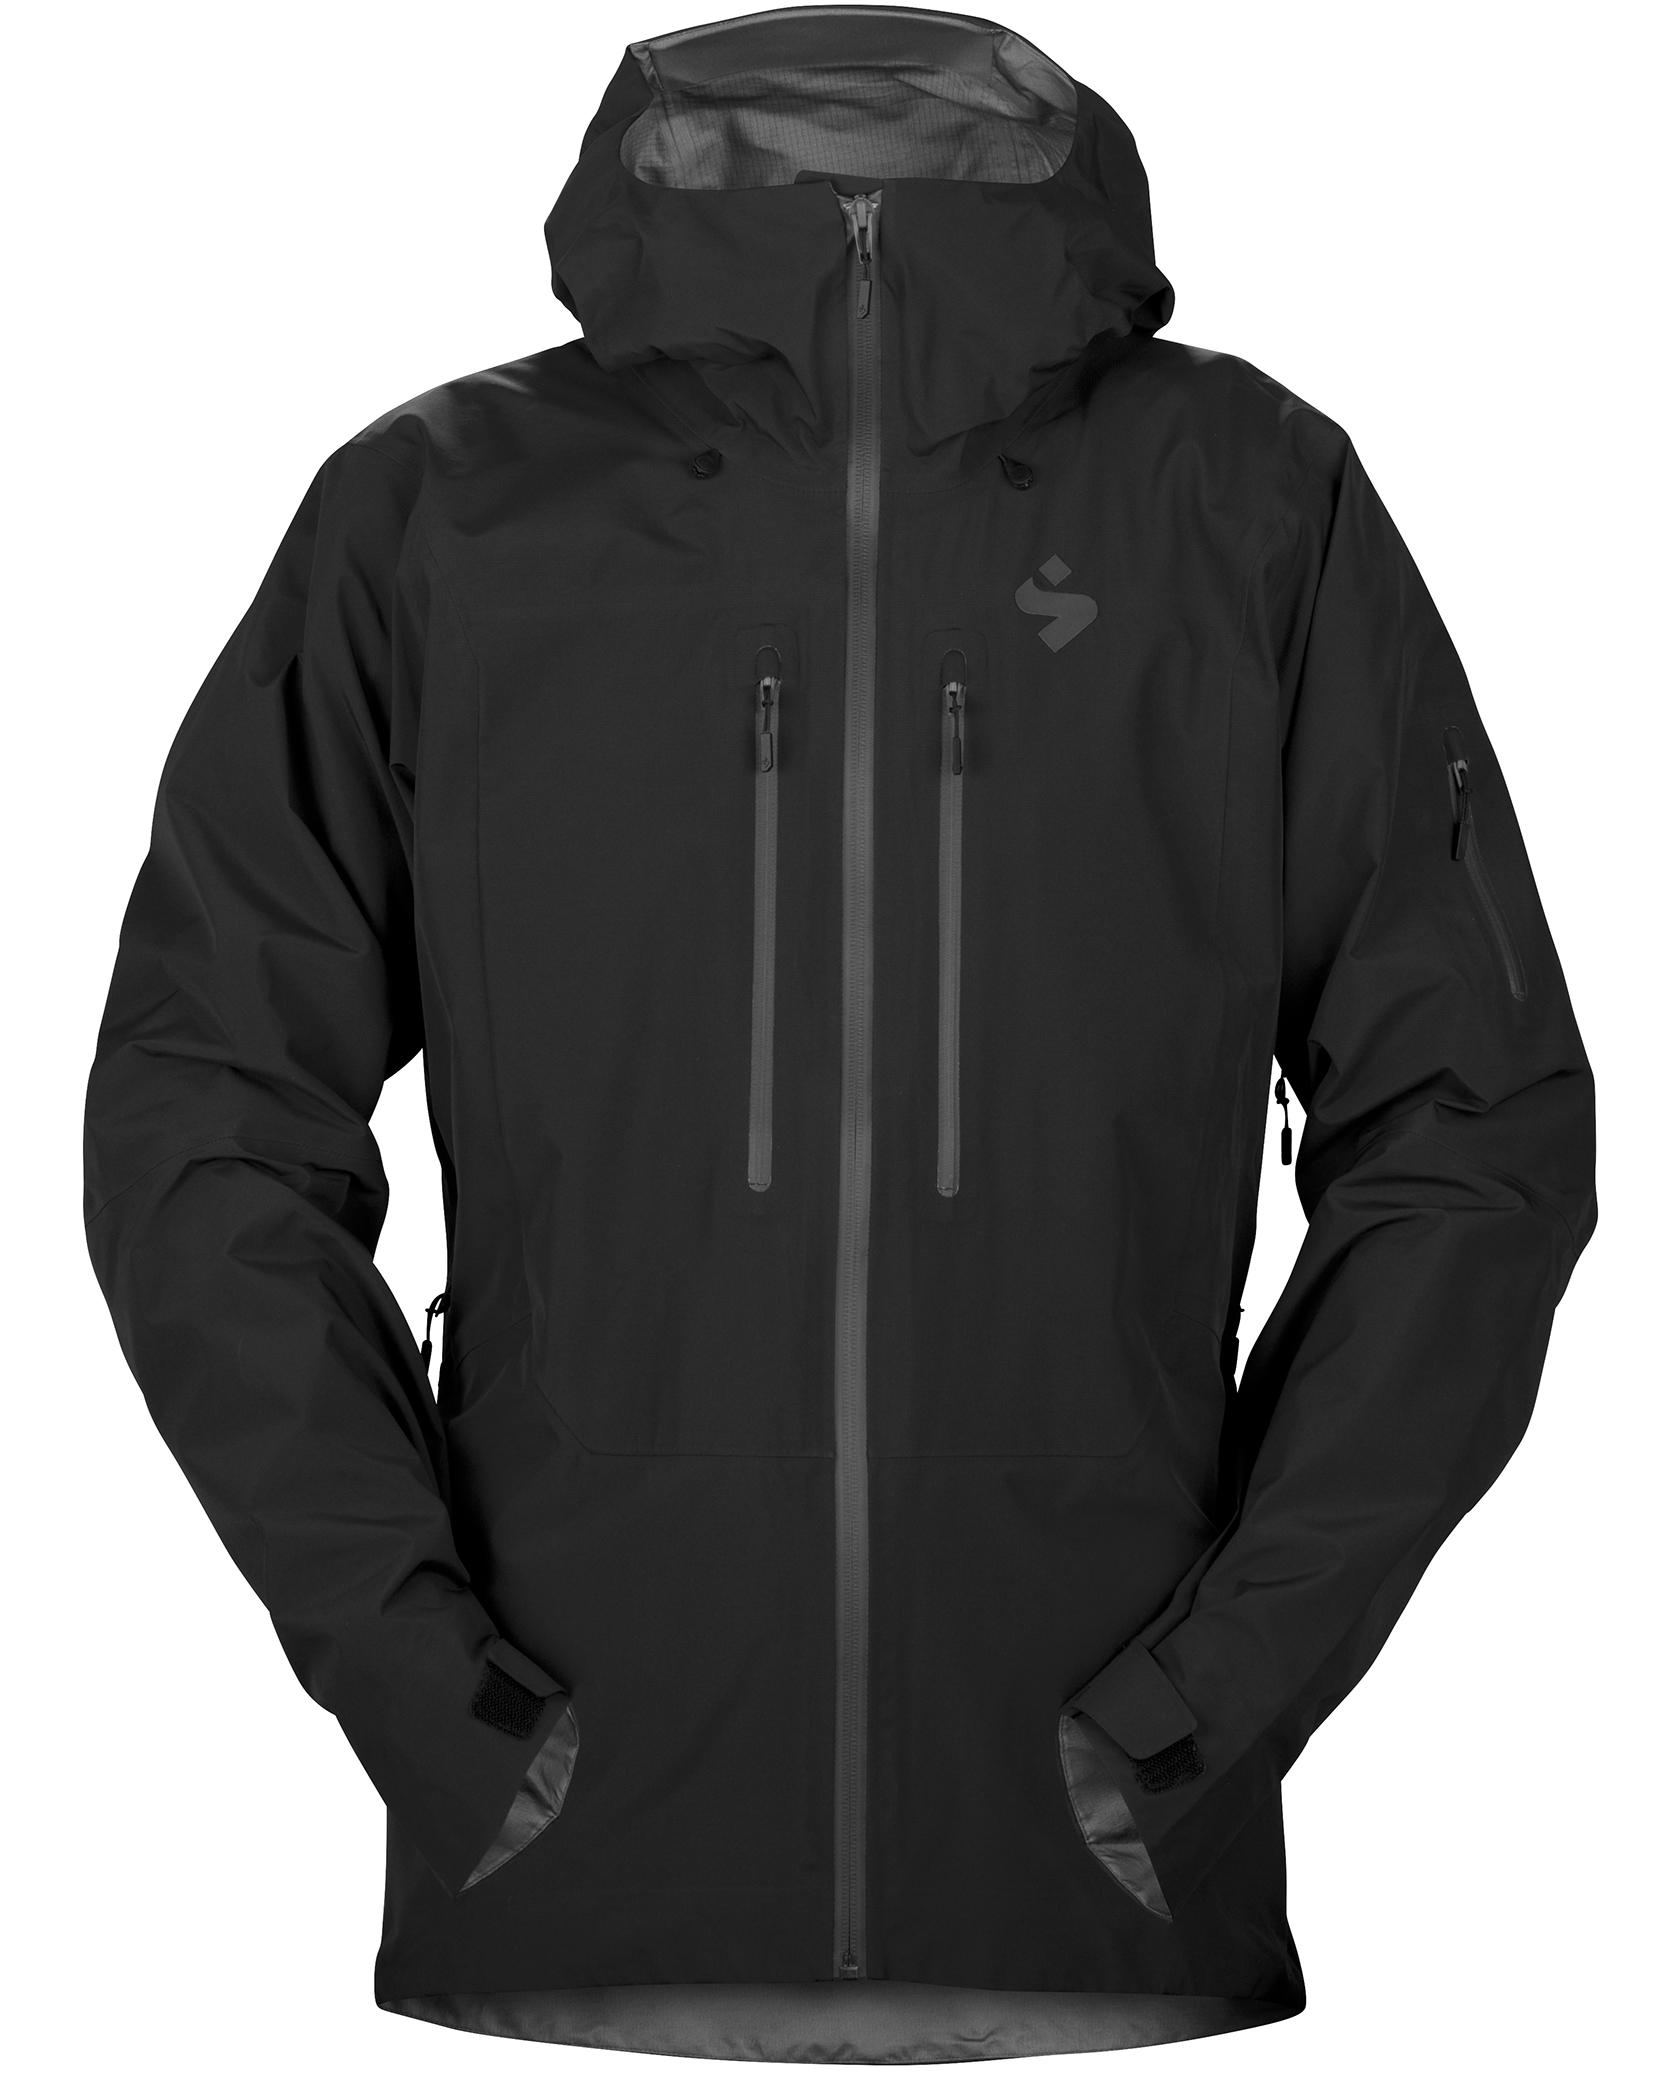 Supernaut Gore Tex Pro Jacket M True Black